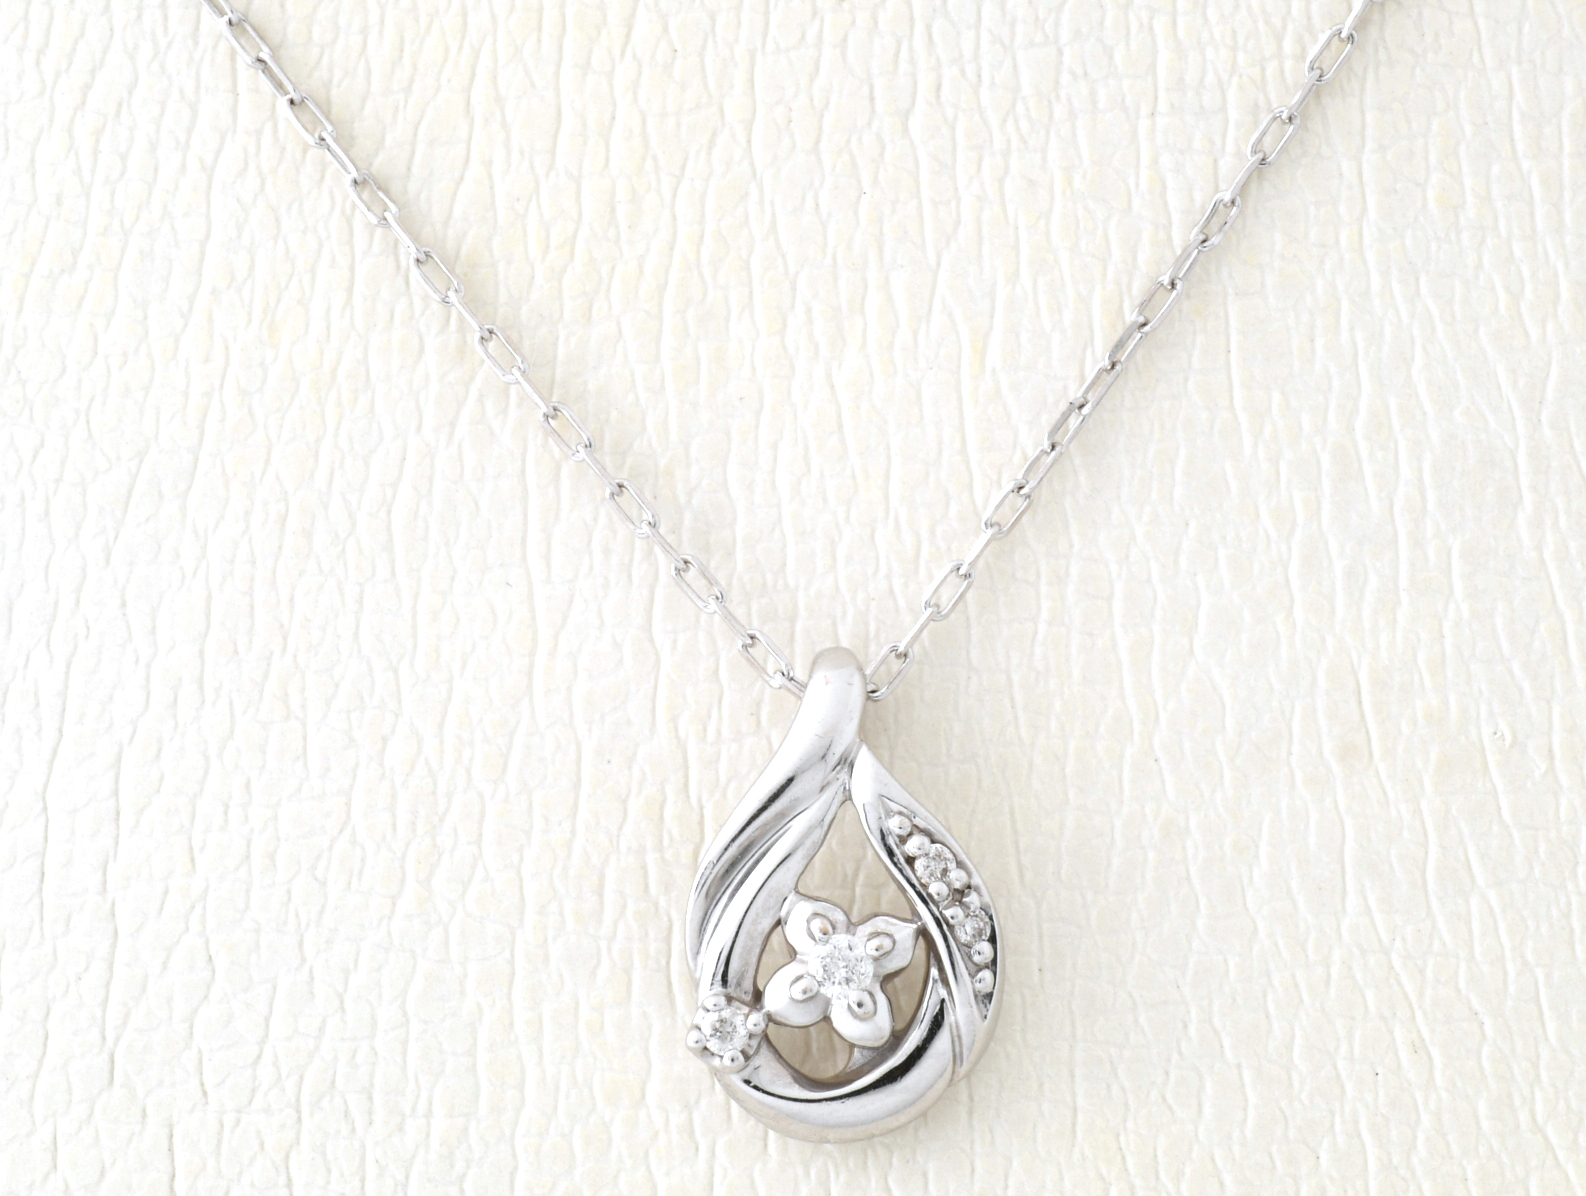 4℃ K18ホワイトゴールド ダイヤモンド ネックレス 【中古】